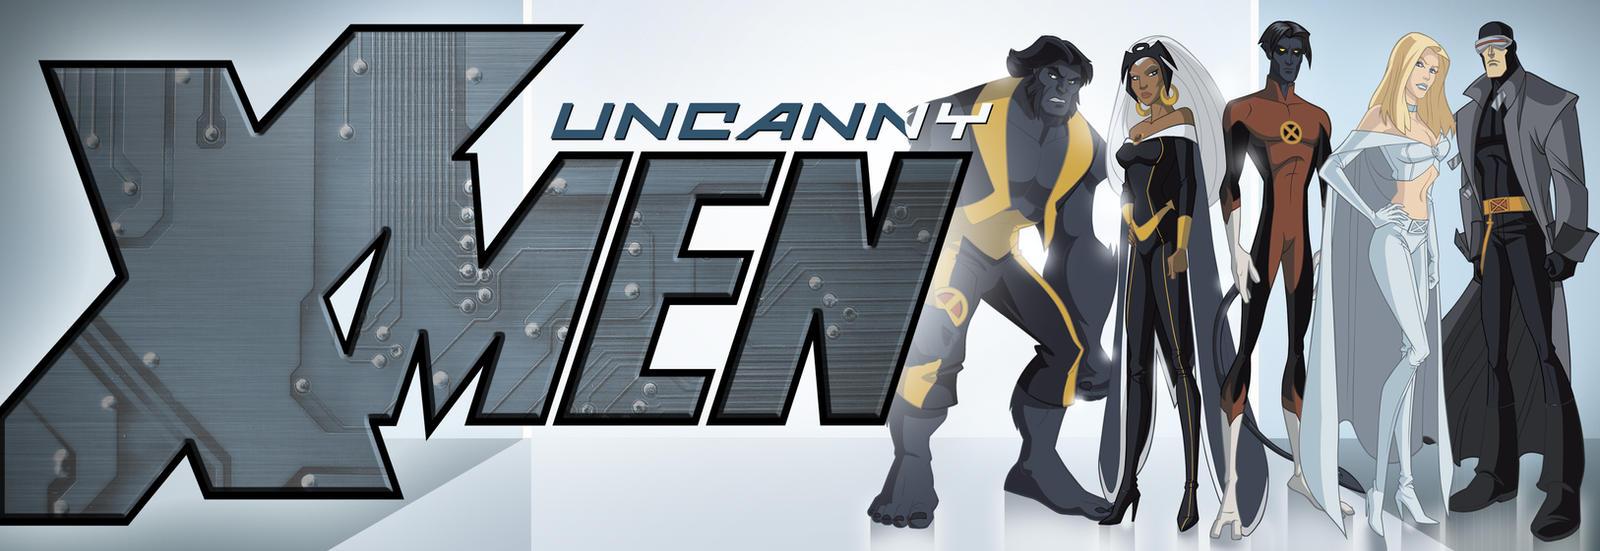 X-Men Wallpaper by GavinMichelli